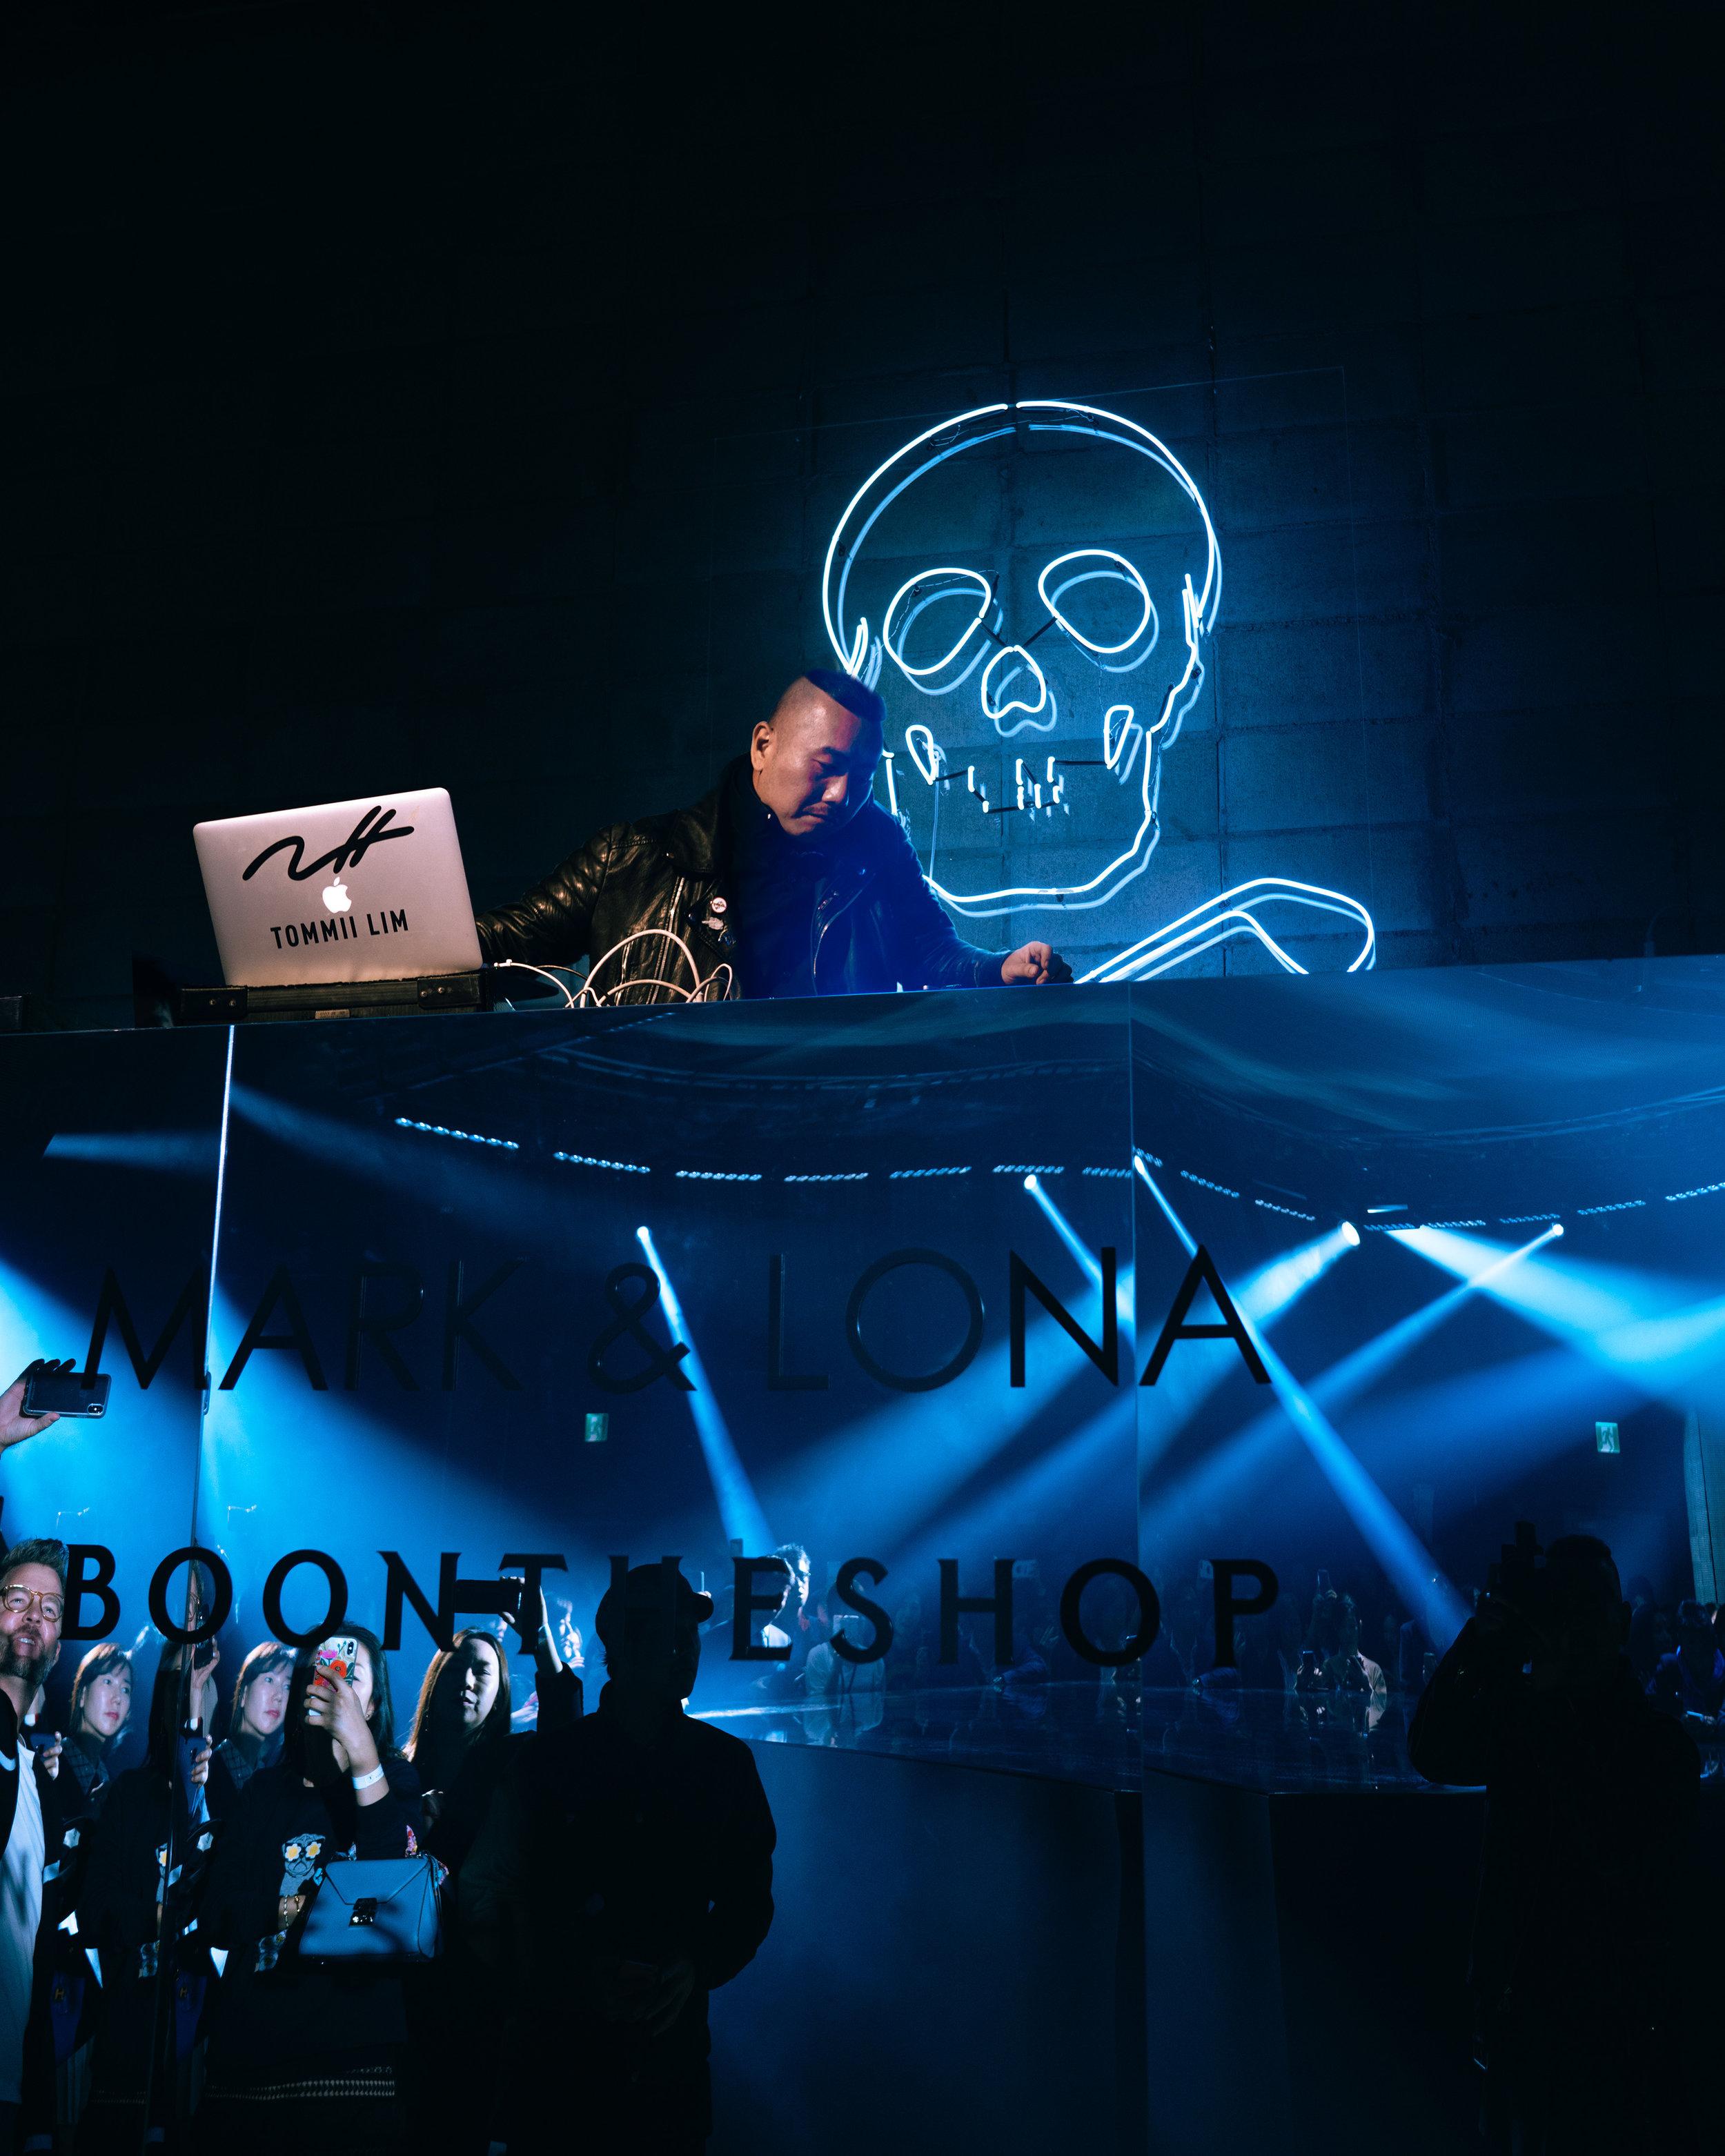 Tommii Lim DJ Mark & Lona.jpg